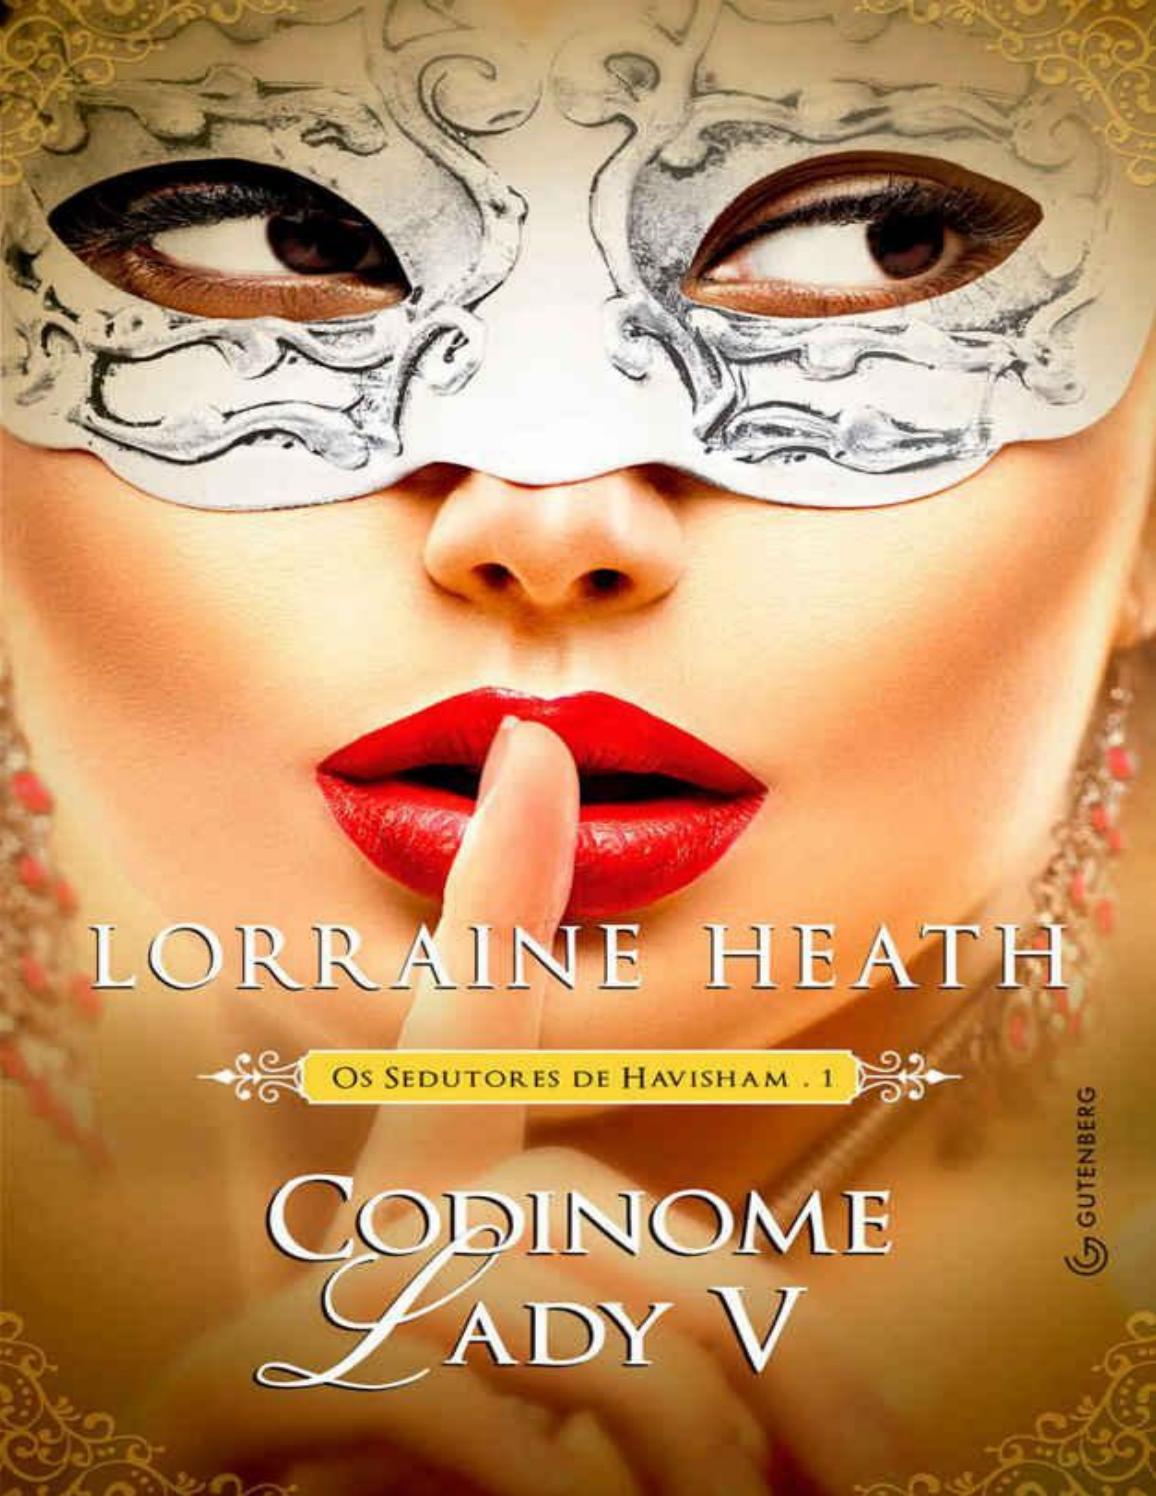 eeb0d633d0c8a Codinome Lady V - Lorraine Heath by naira.qr - issuu